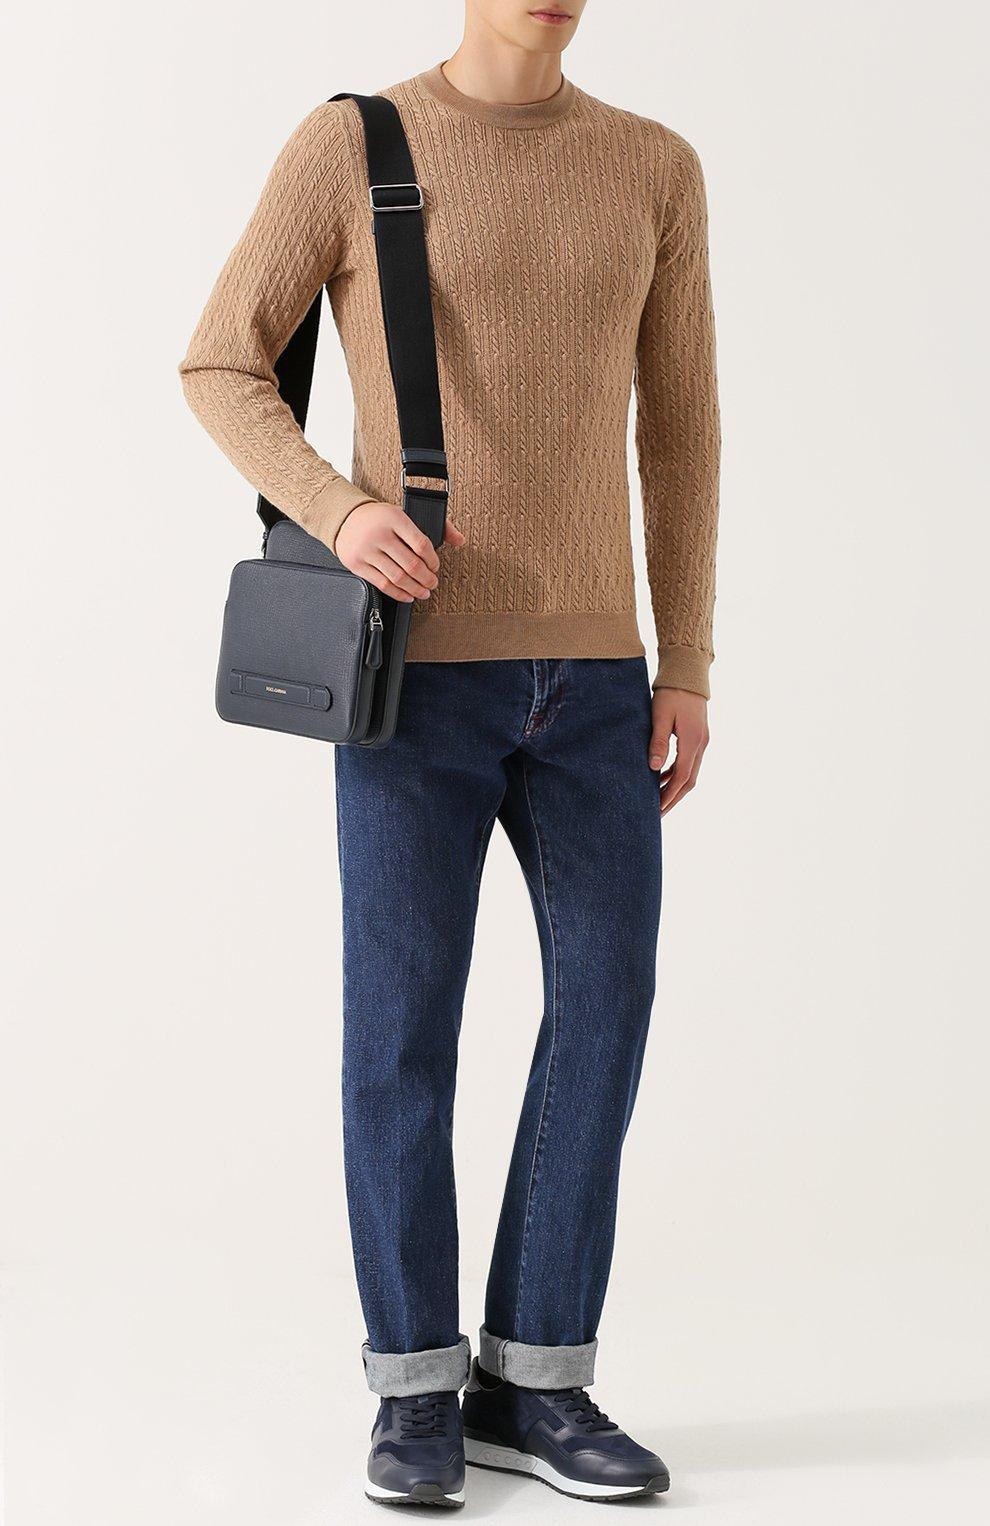 Кожаная сумка-планшет Mediterraneo с двумя отделениями на молнии Dolce & Gabbana темно-синяя | Фото №2